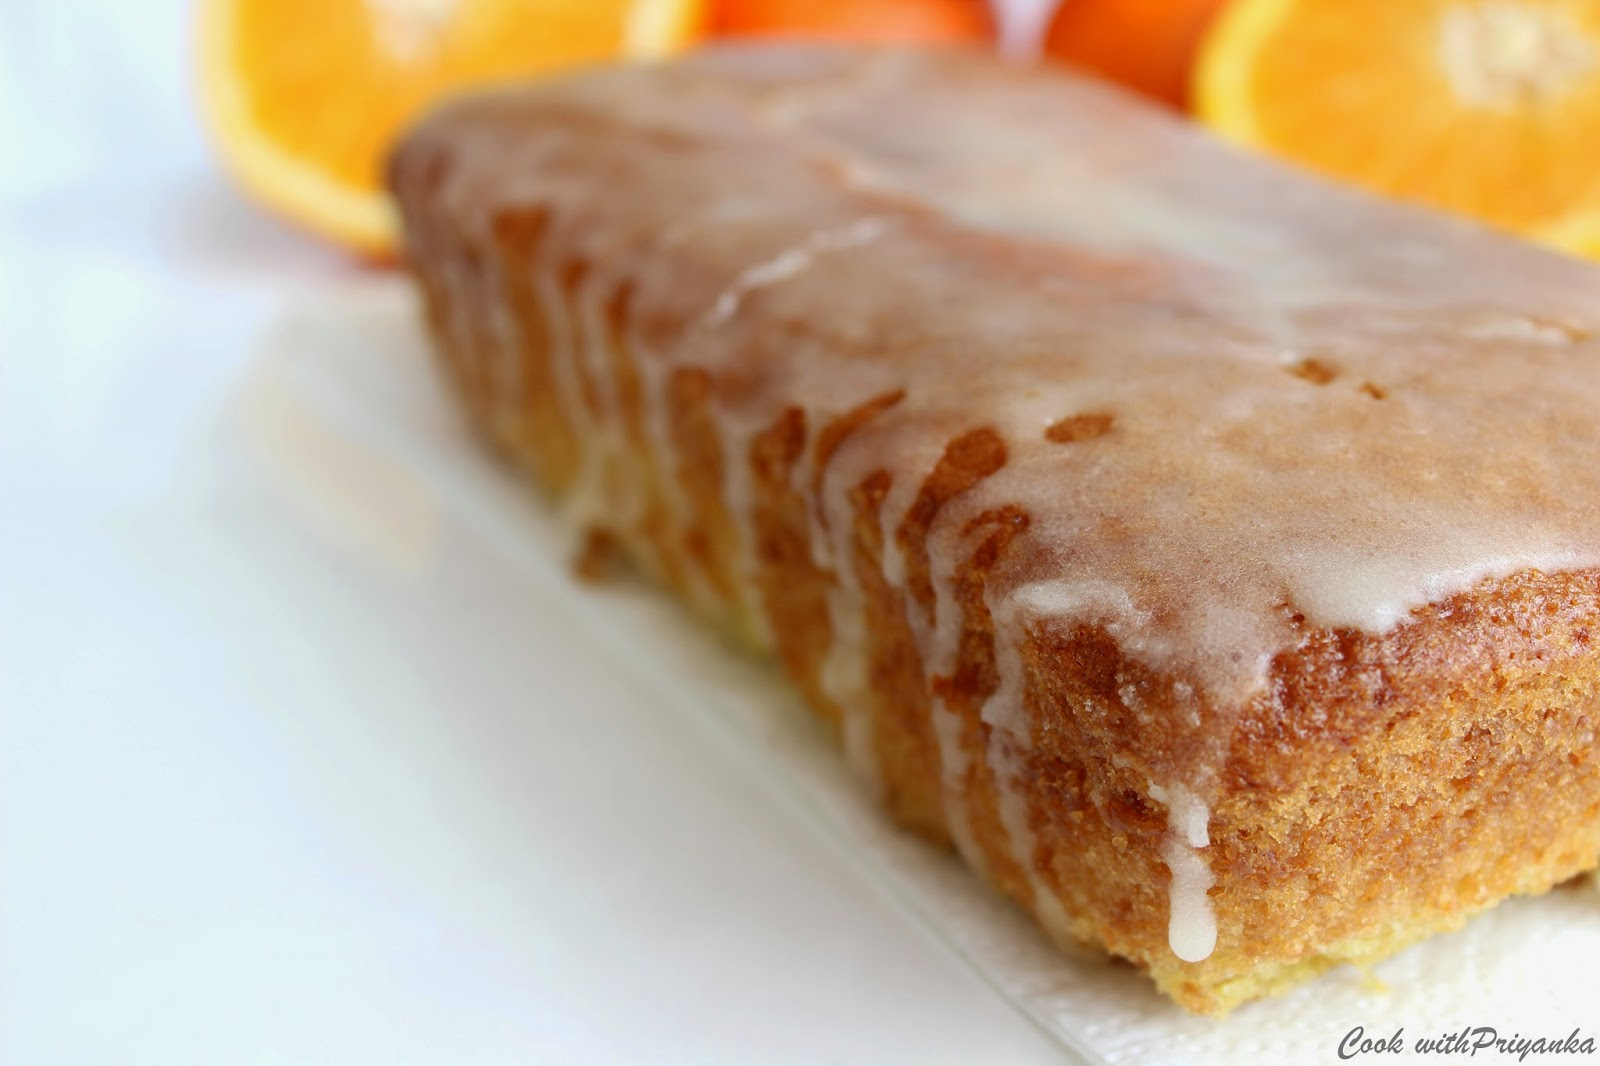 http://cookwithpriyankavarma.blogspot.co.uk/2014/06/orange-cake-eggless-without-condensed.html